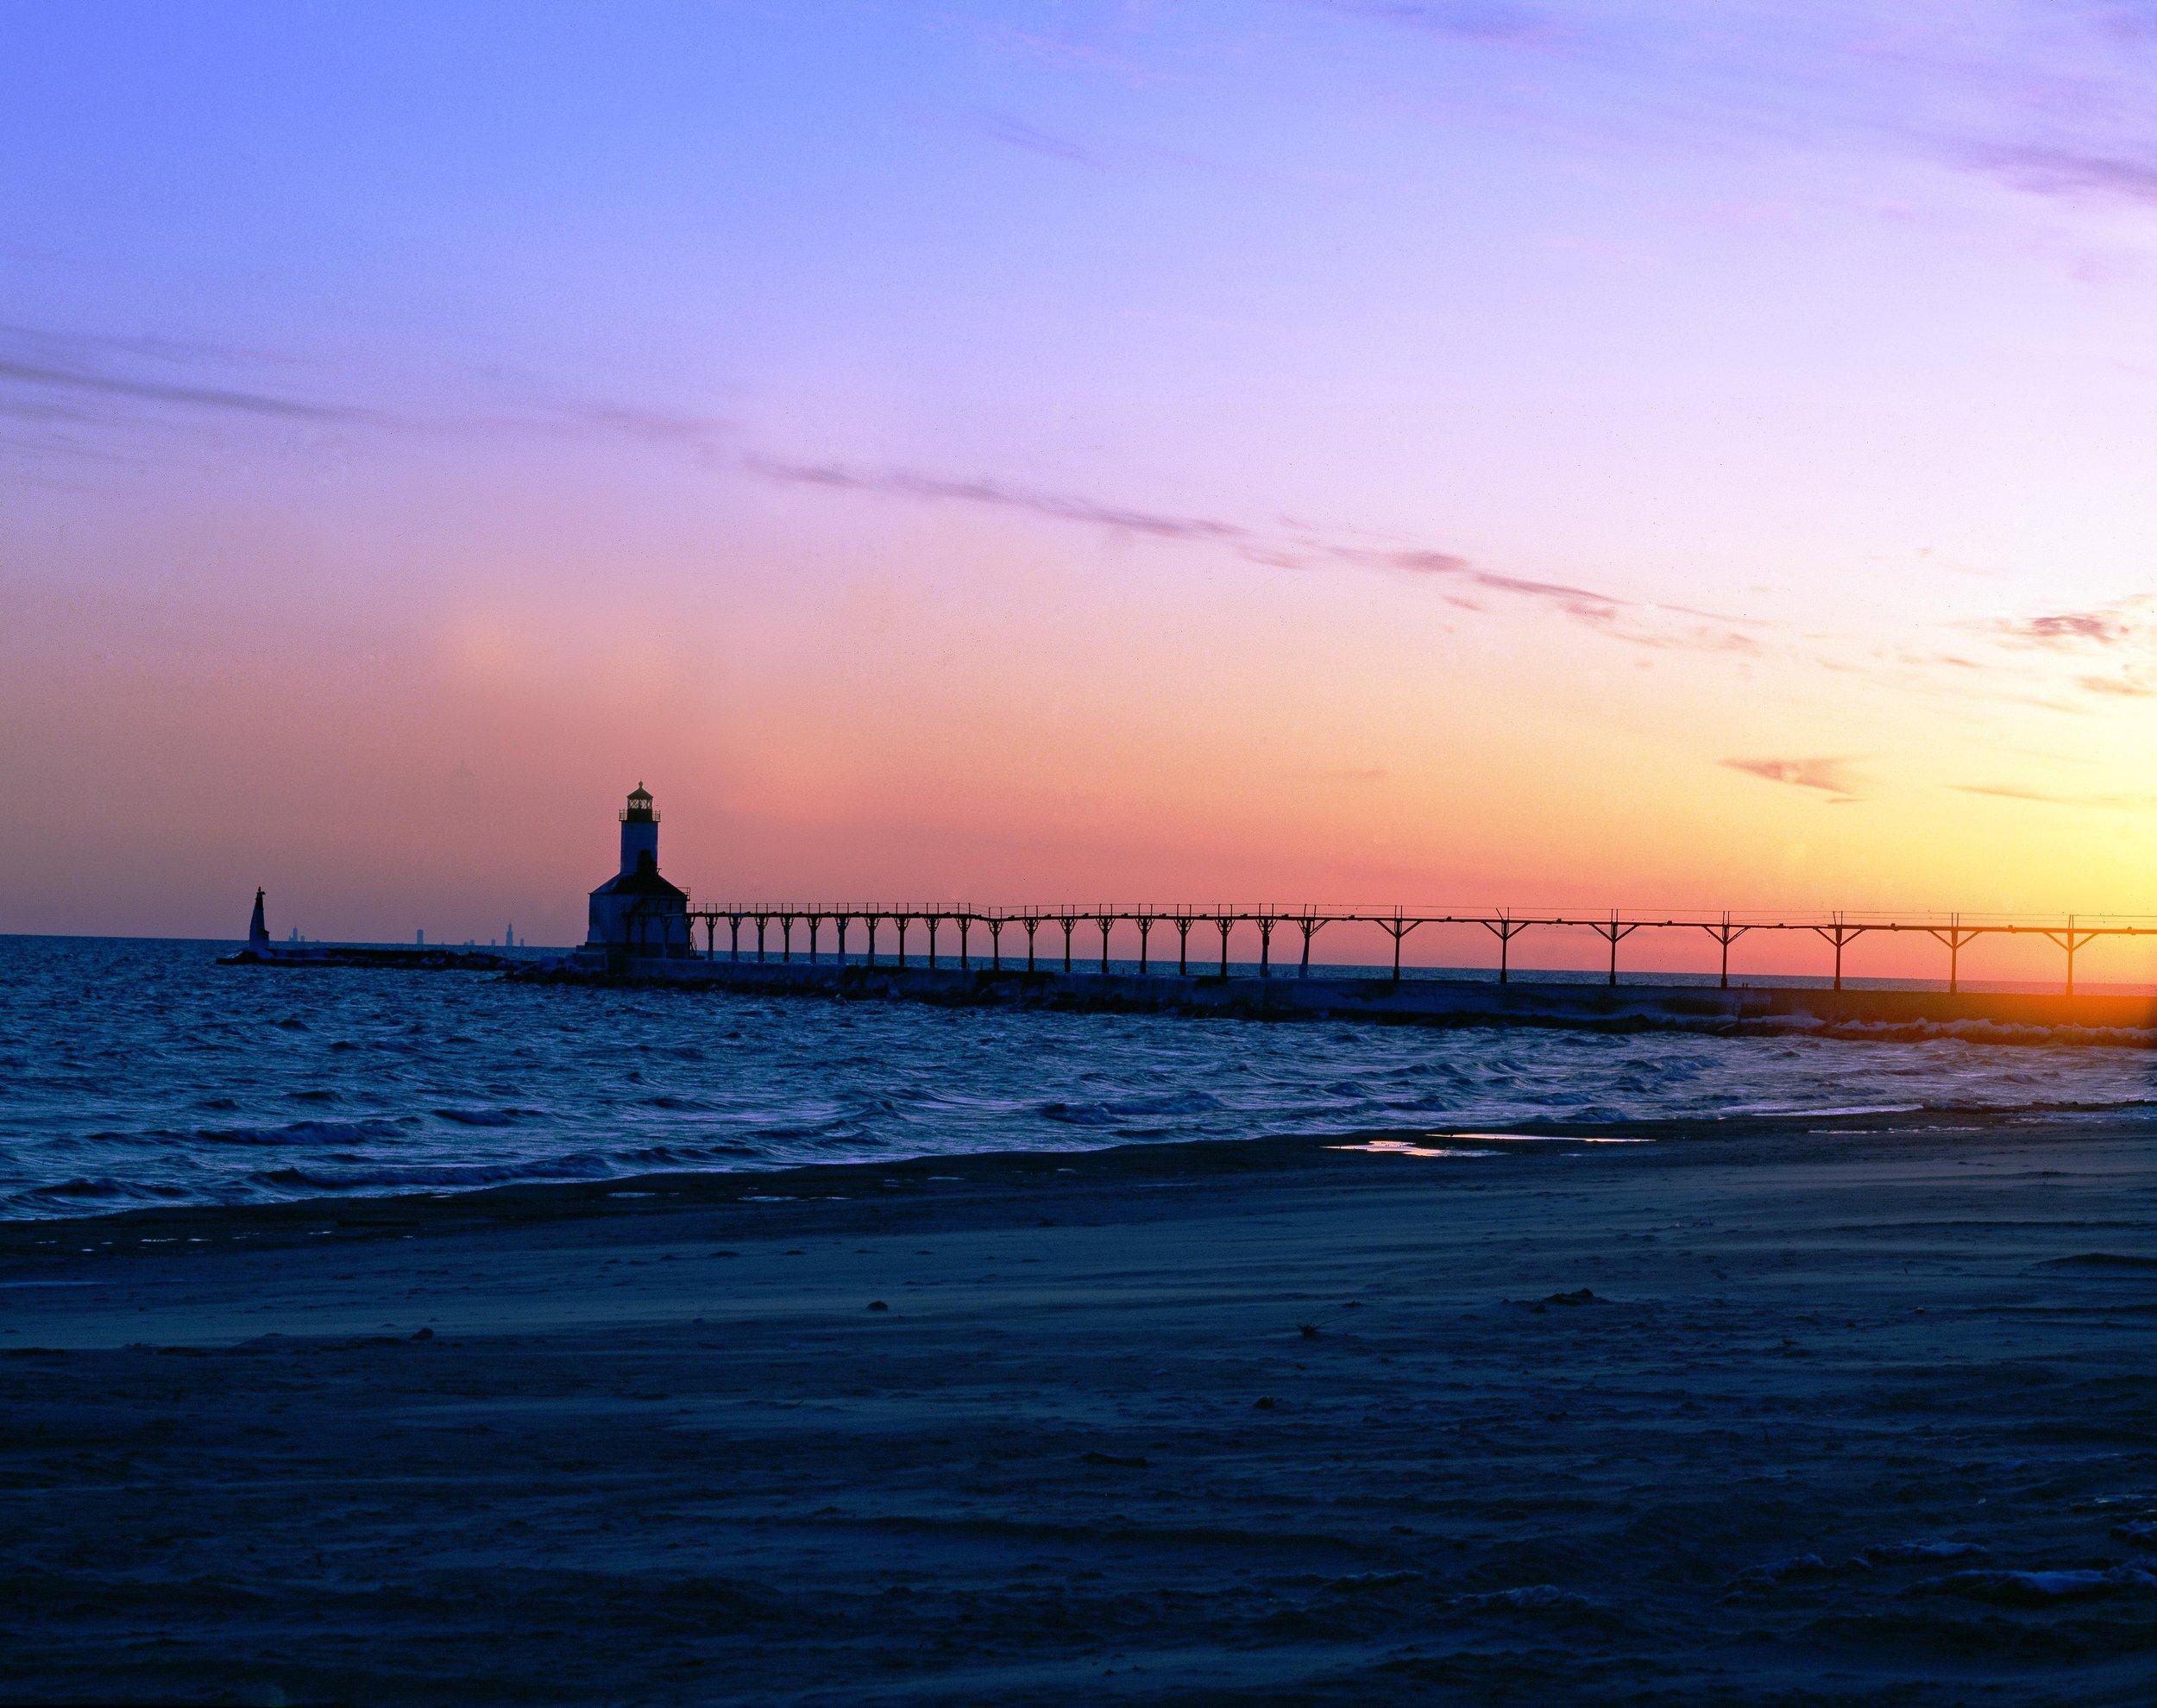 coast-dawn-dusk-210379.jpg